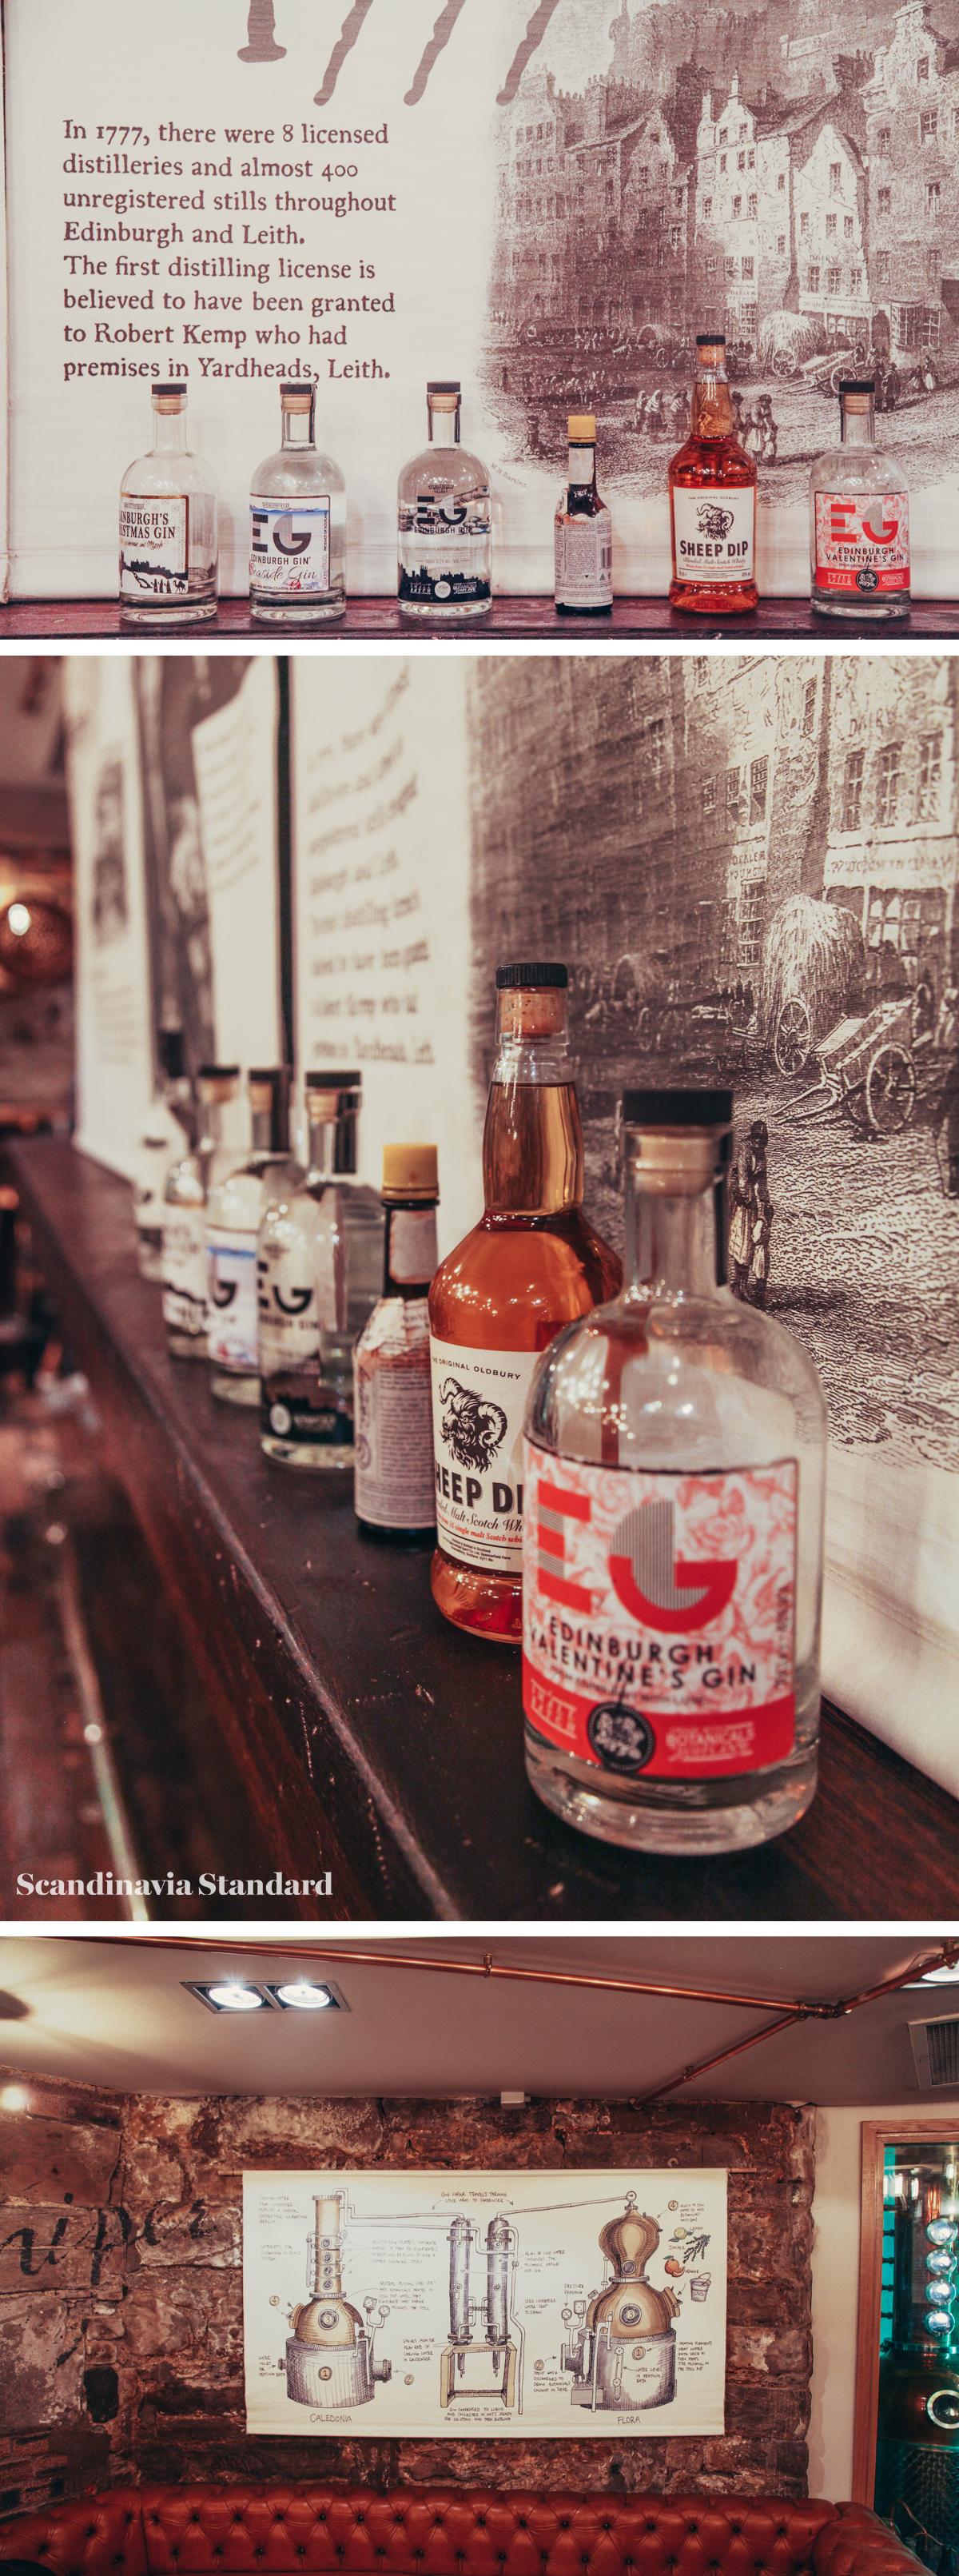 Edinburgh Gin Distillery | Scandinavia Standard